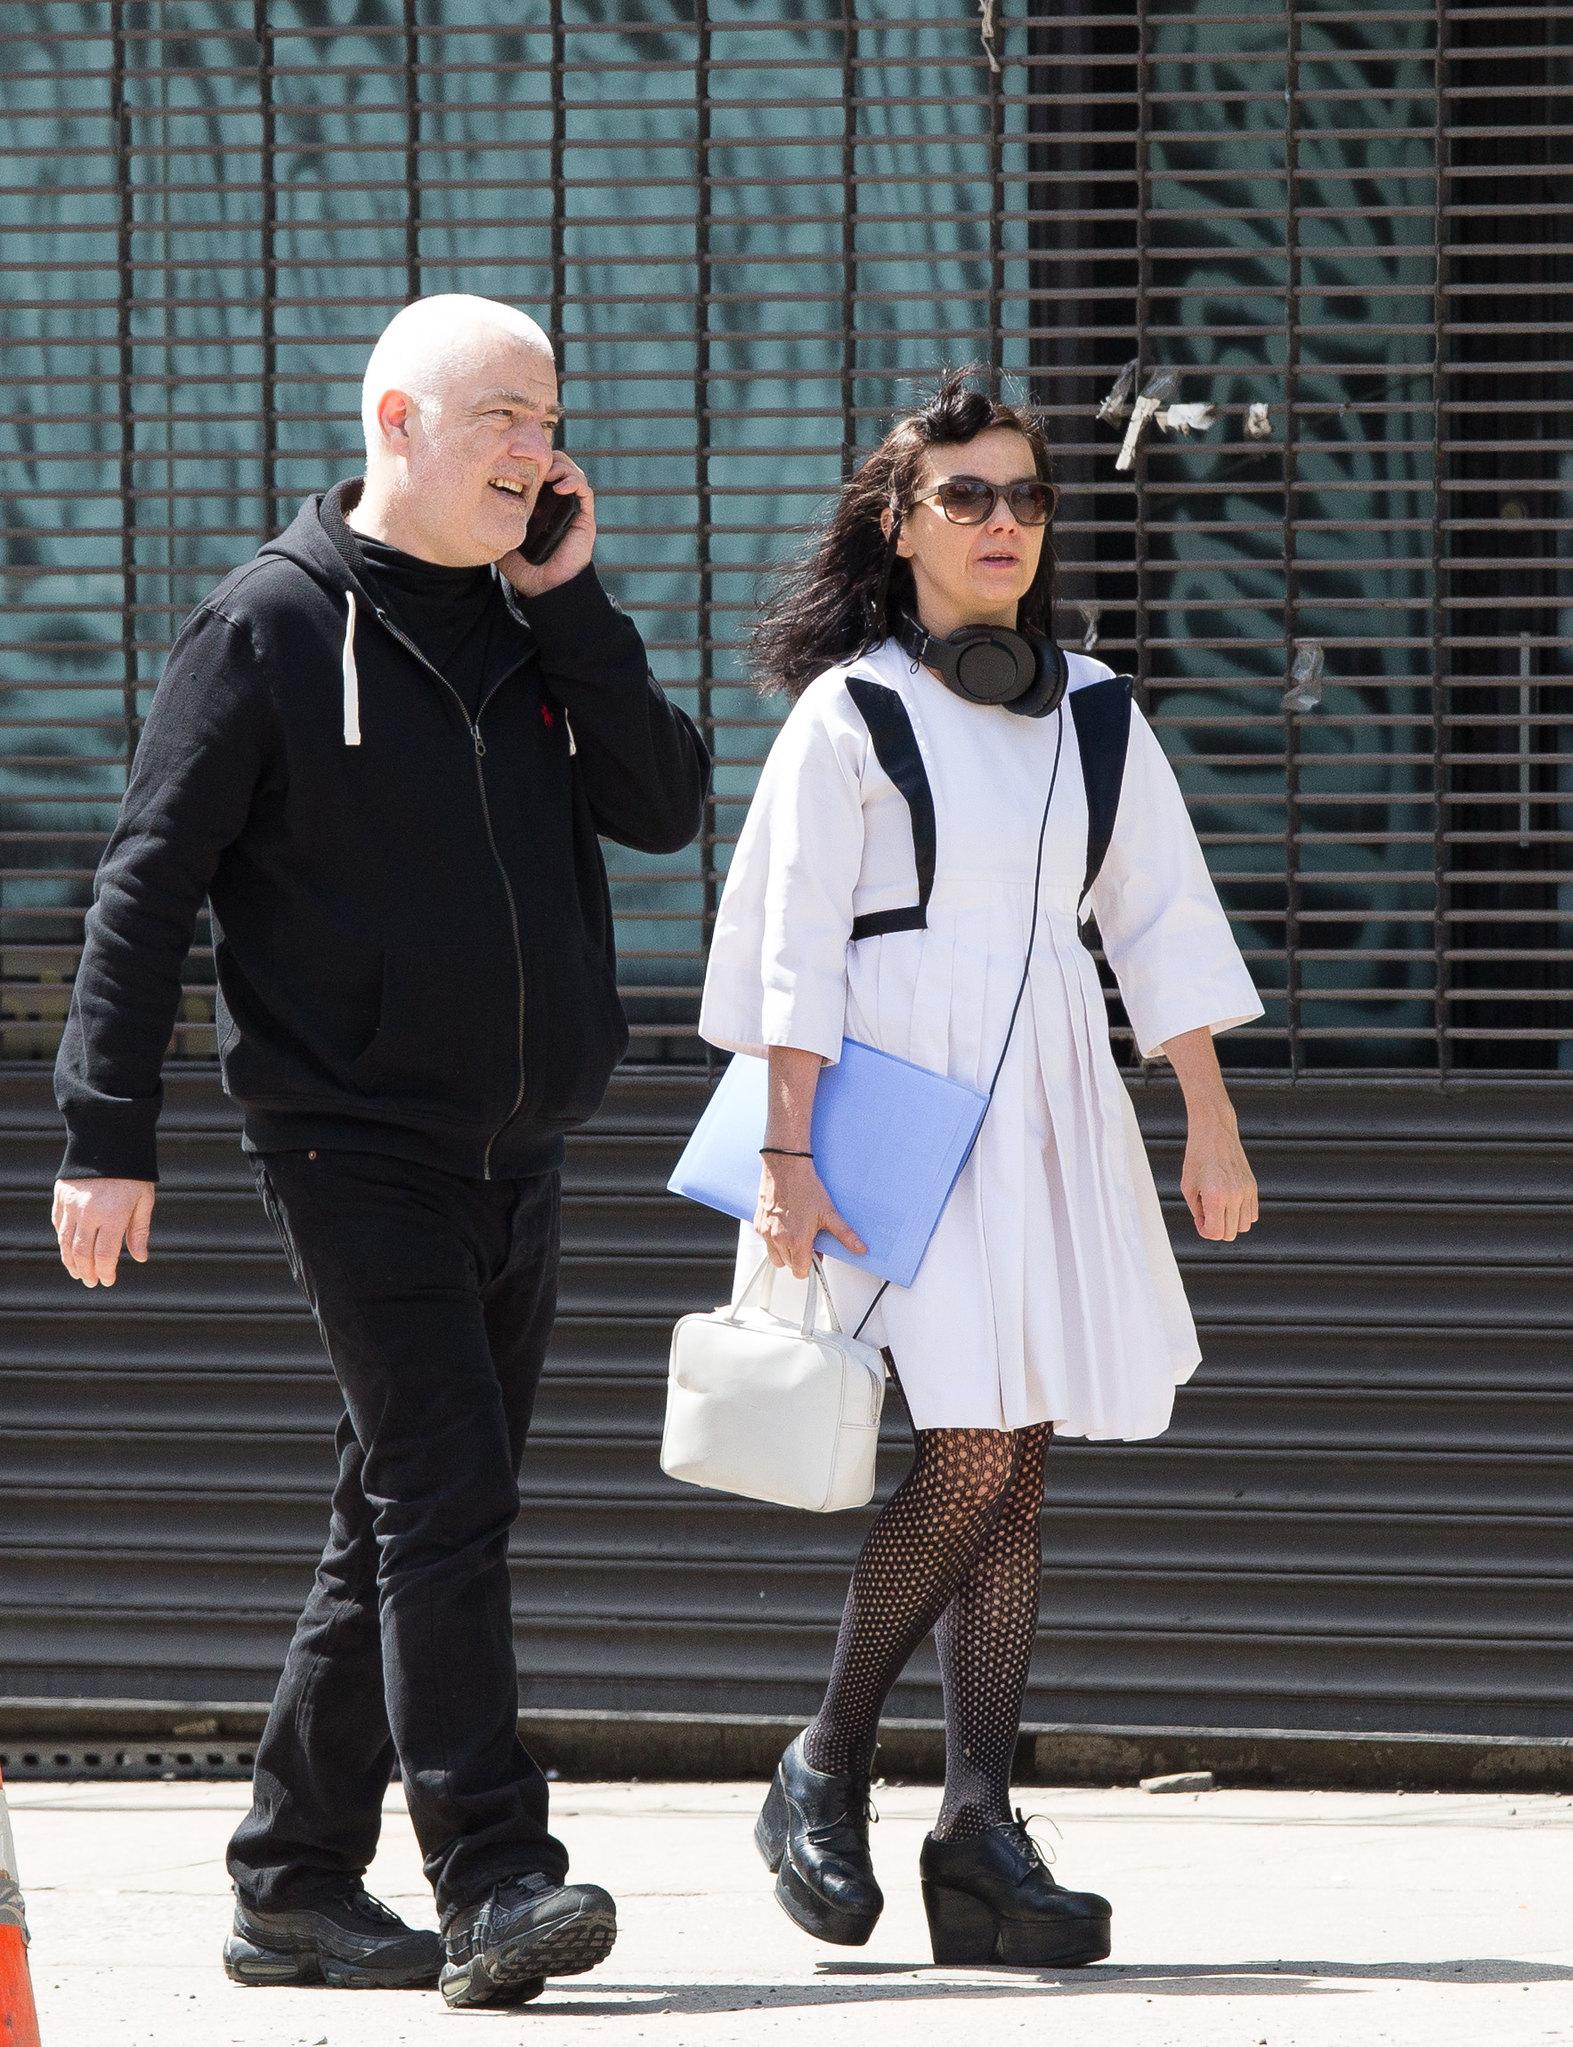 Singer Bjork seen out walking around Chinatown NYC 4/15/15 ...